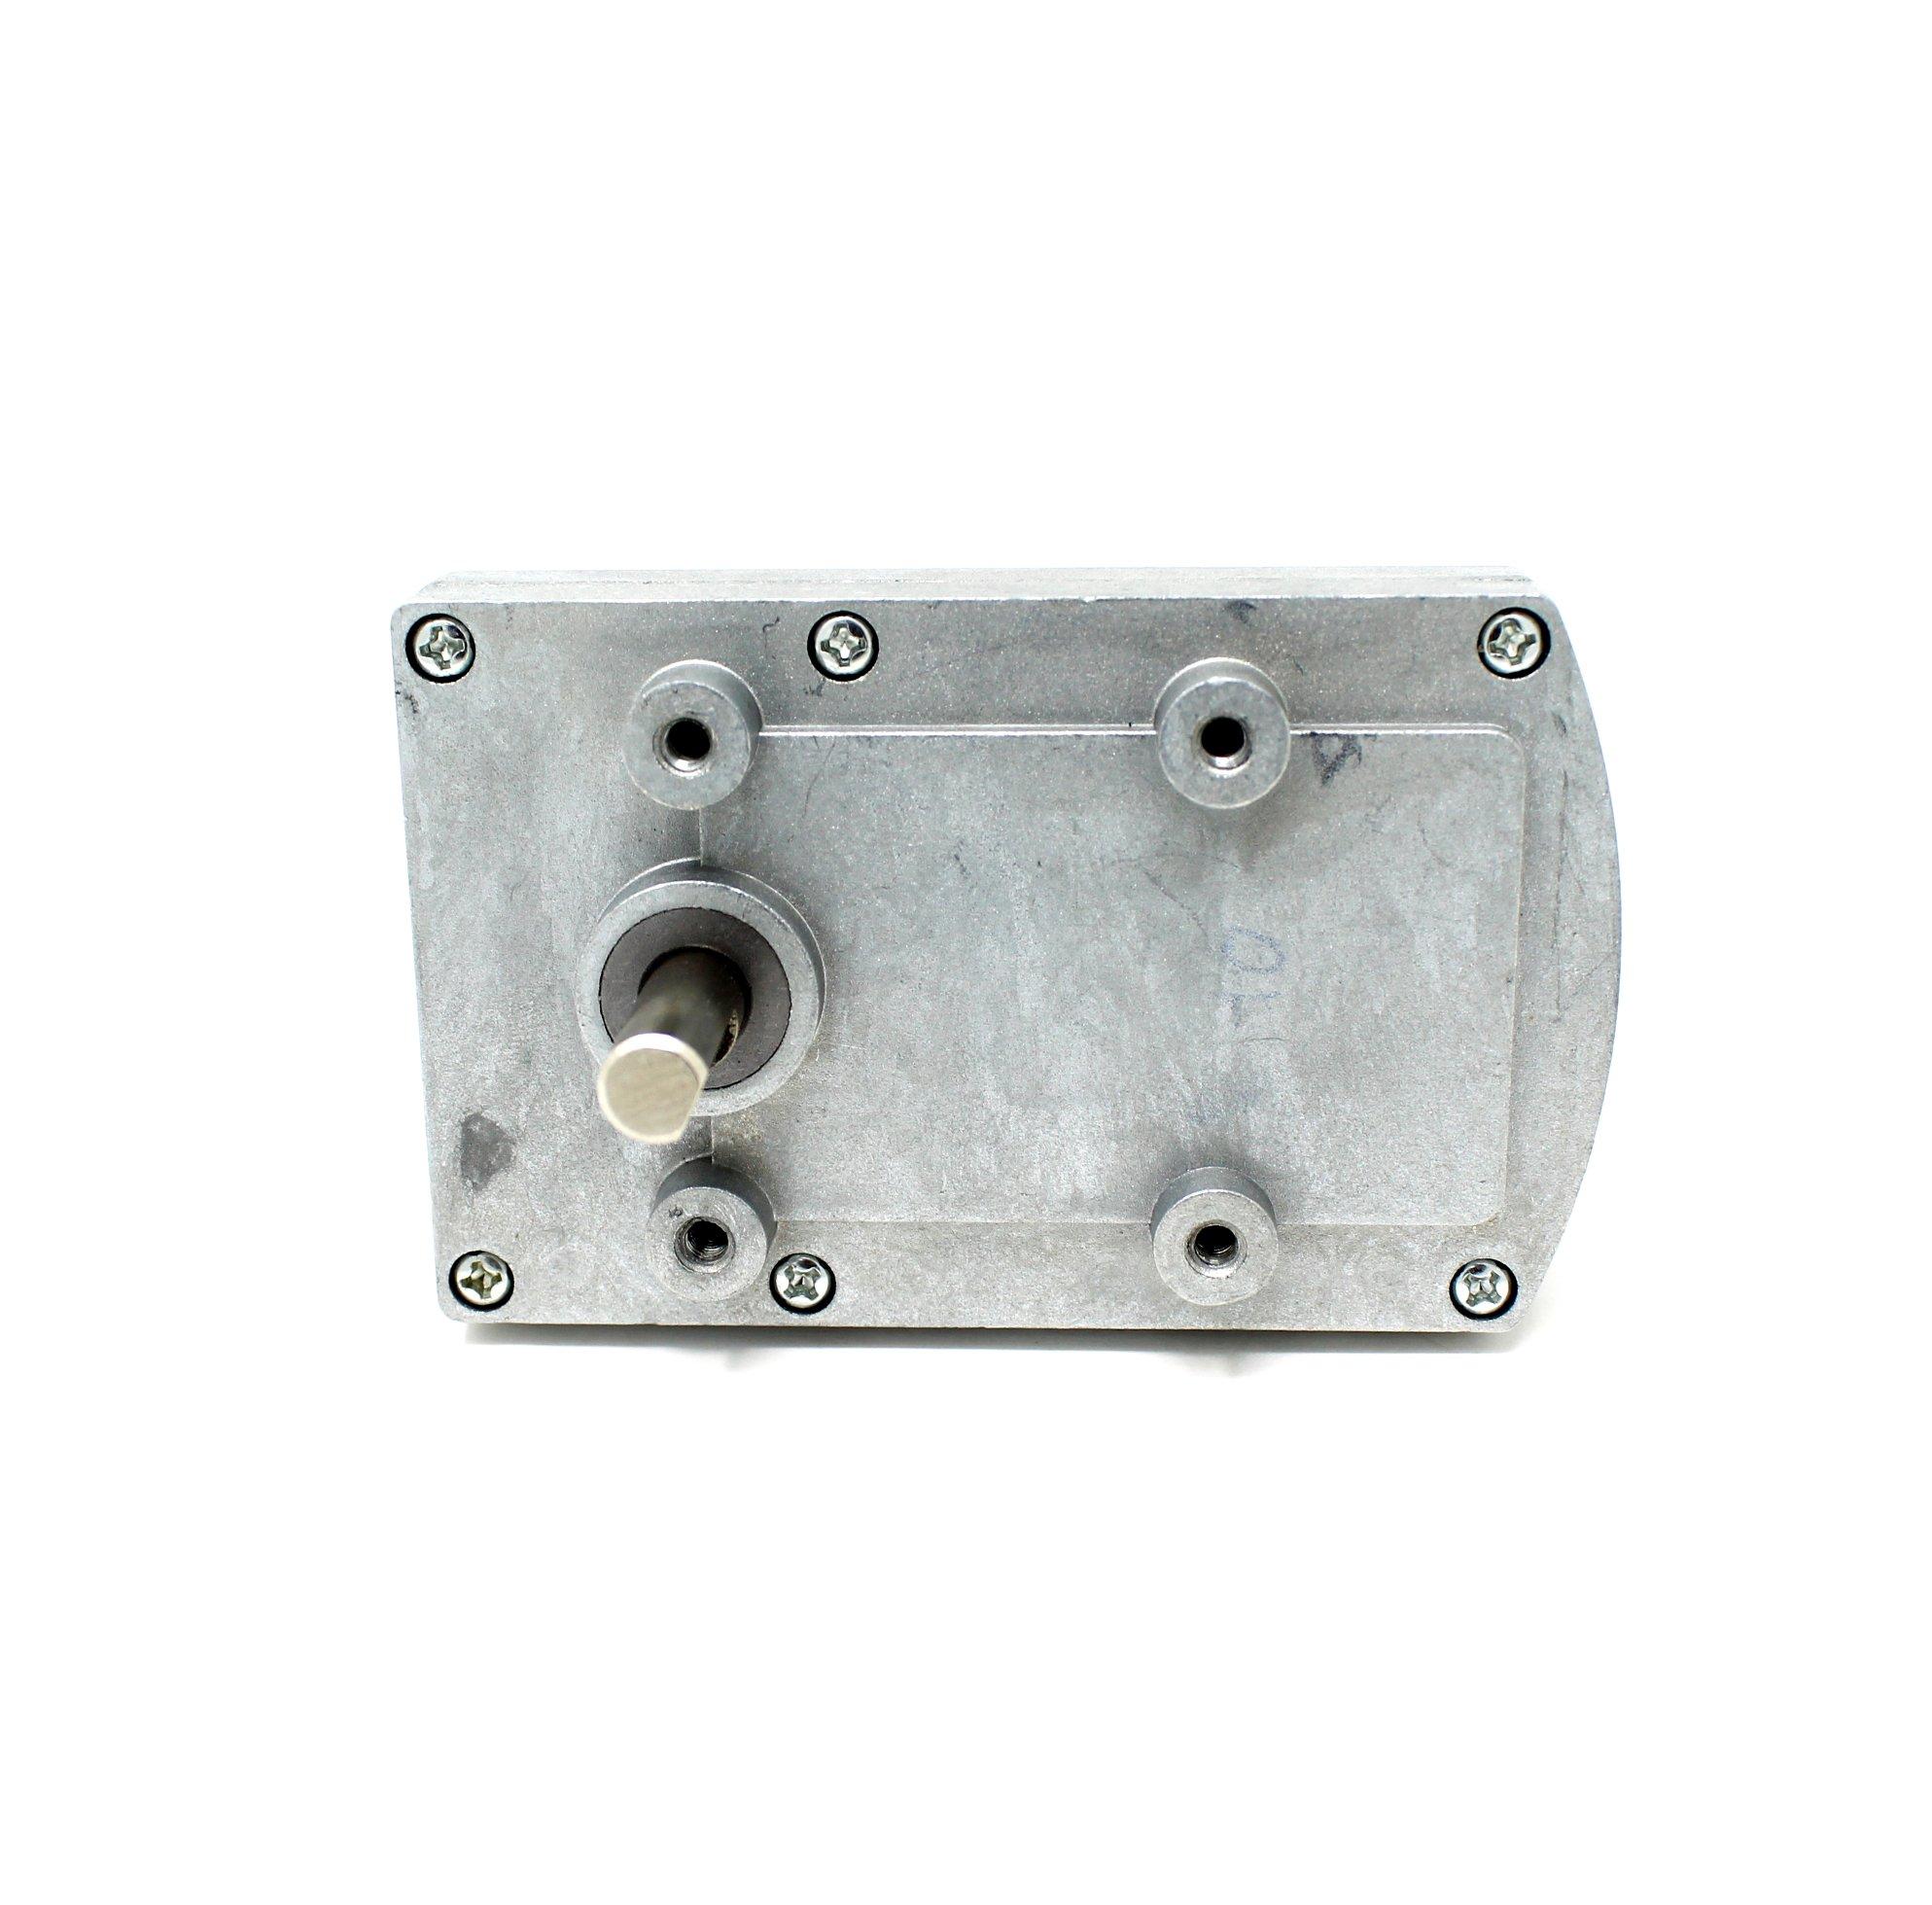 Rectangular GearBox Motor - 10RPM